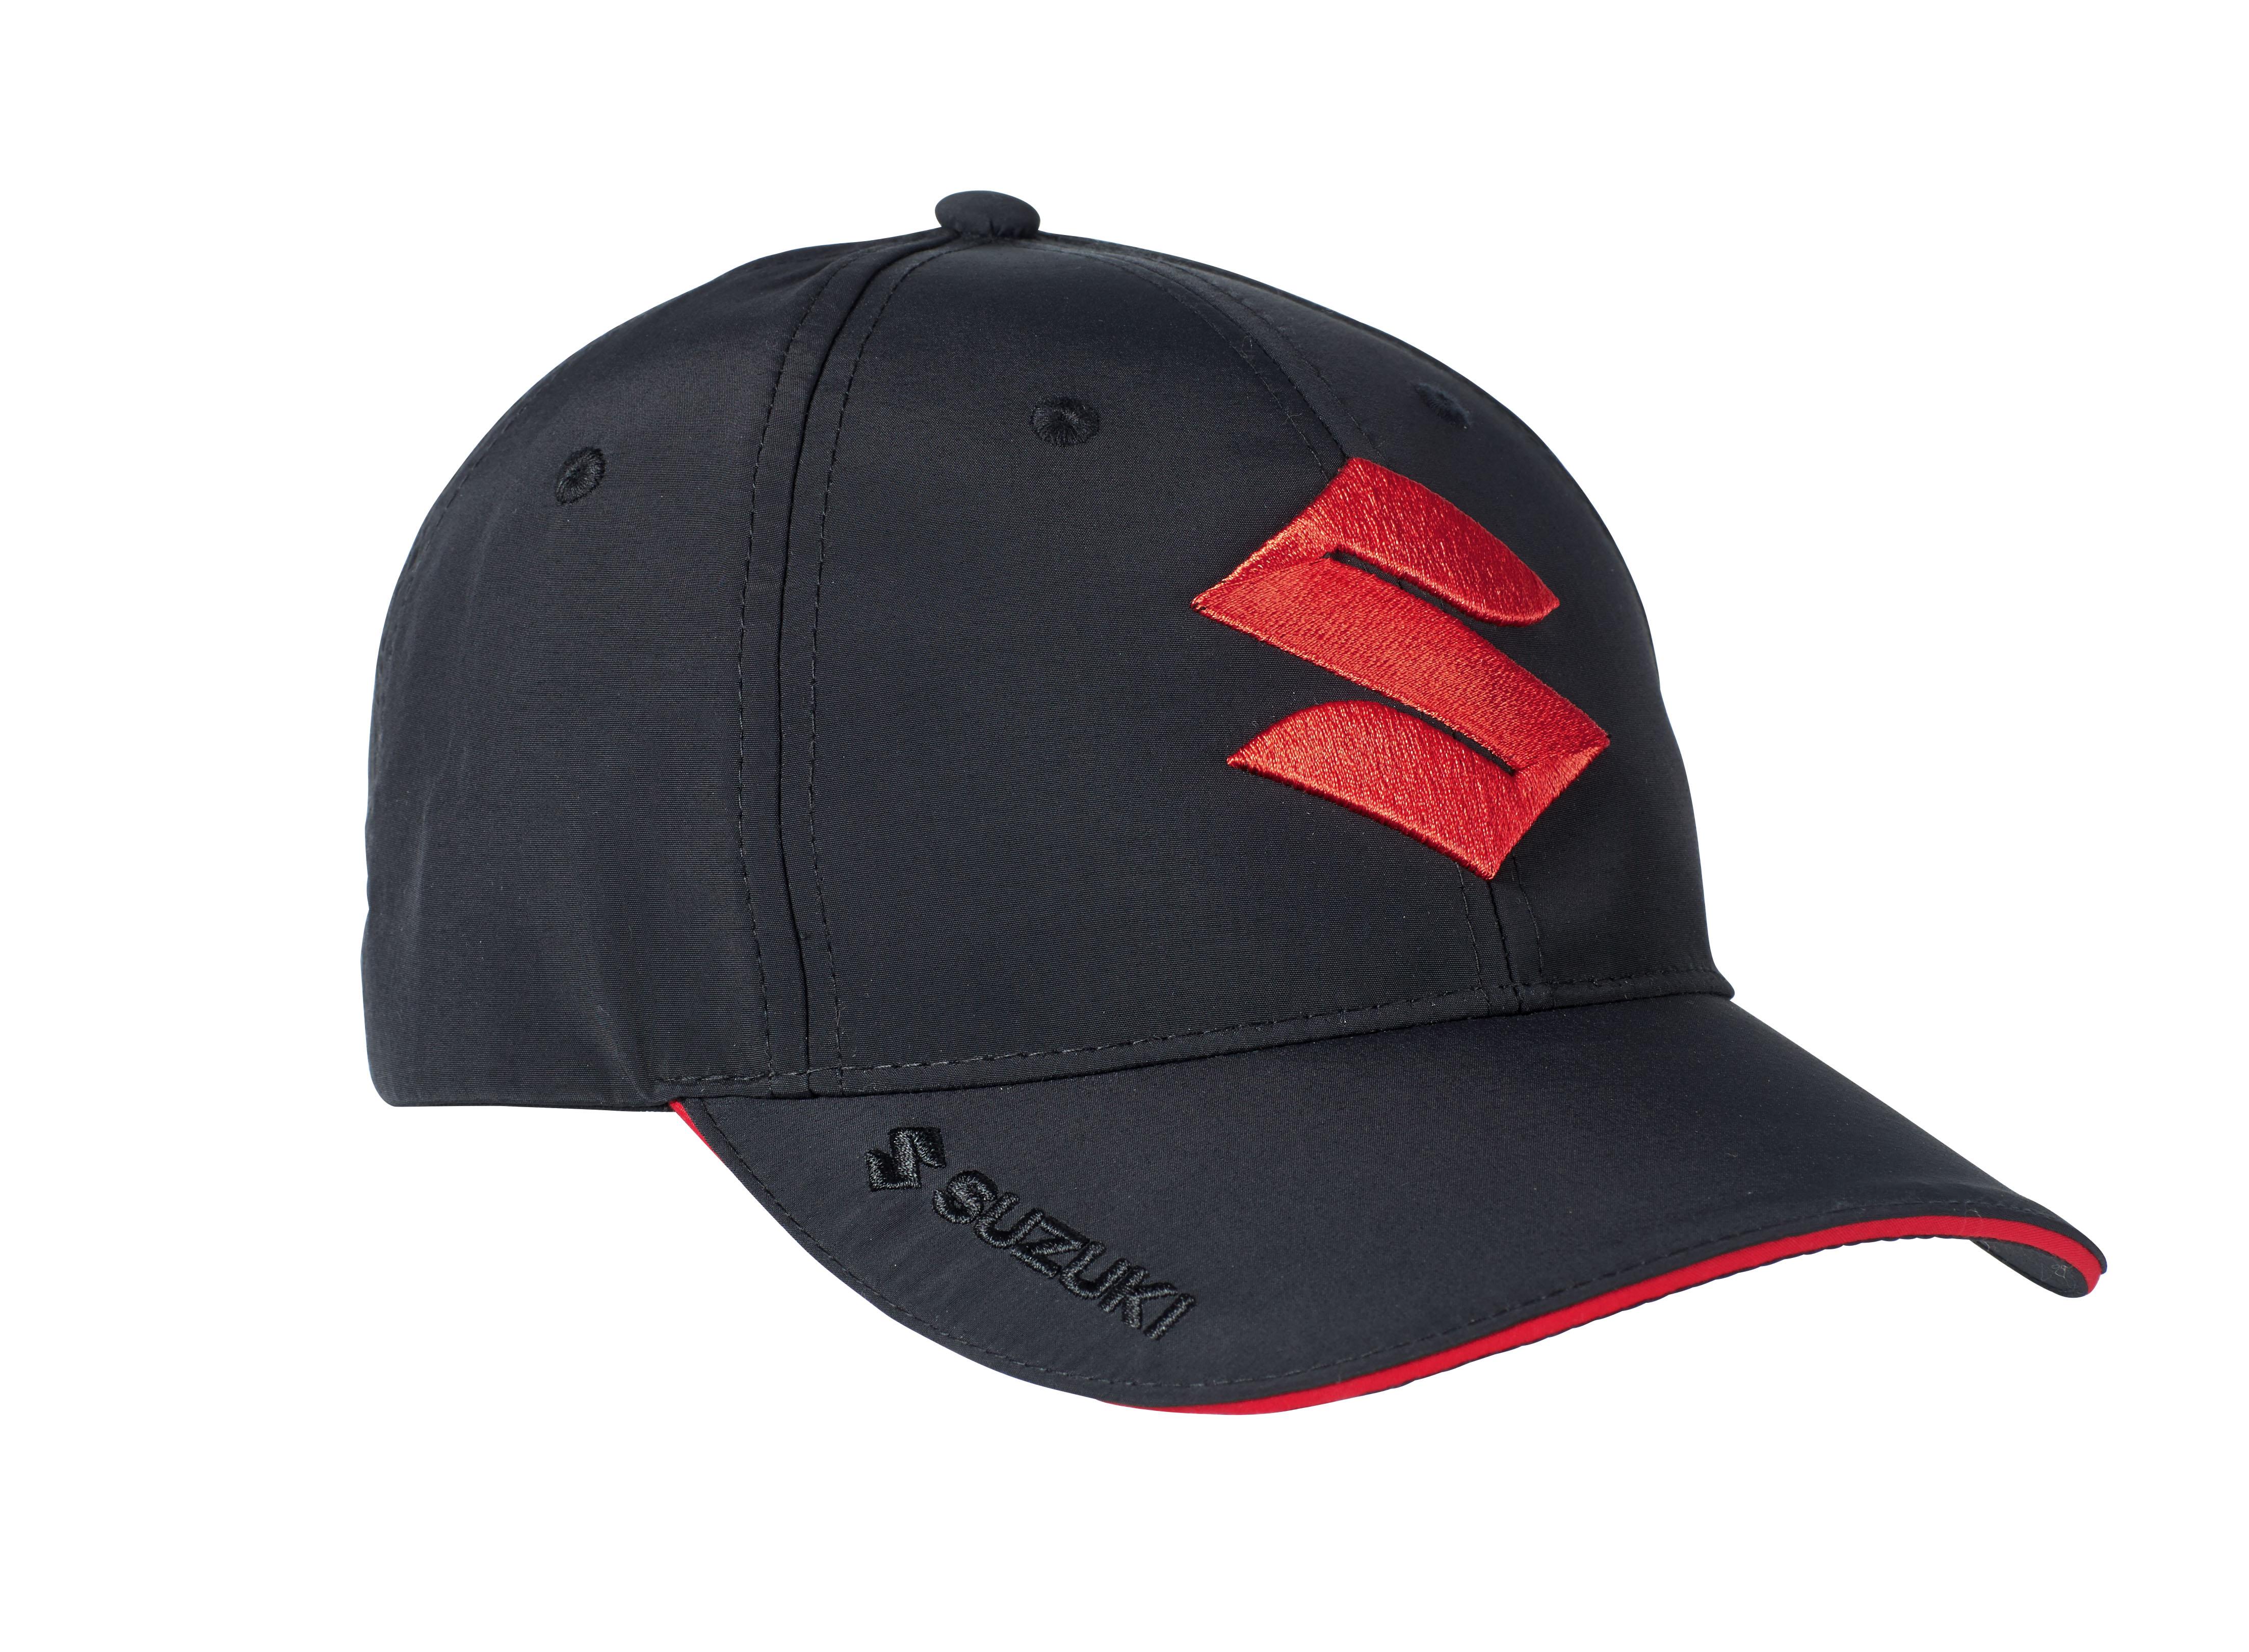 suzuki team mens womens baseball hat cap embroidered logos